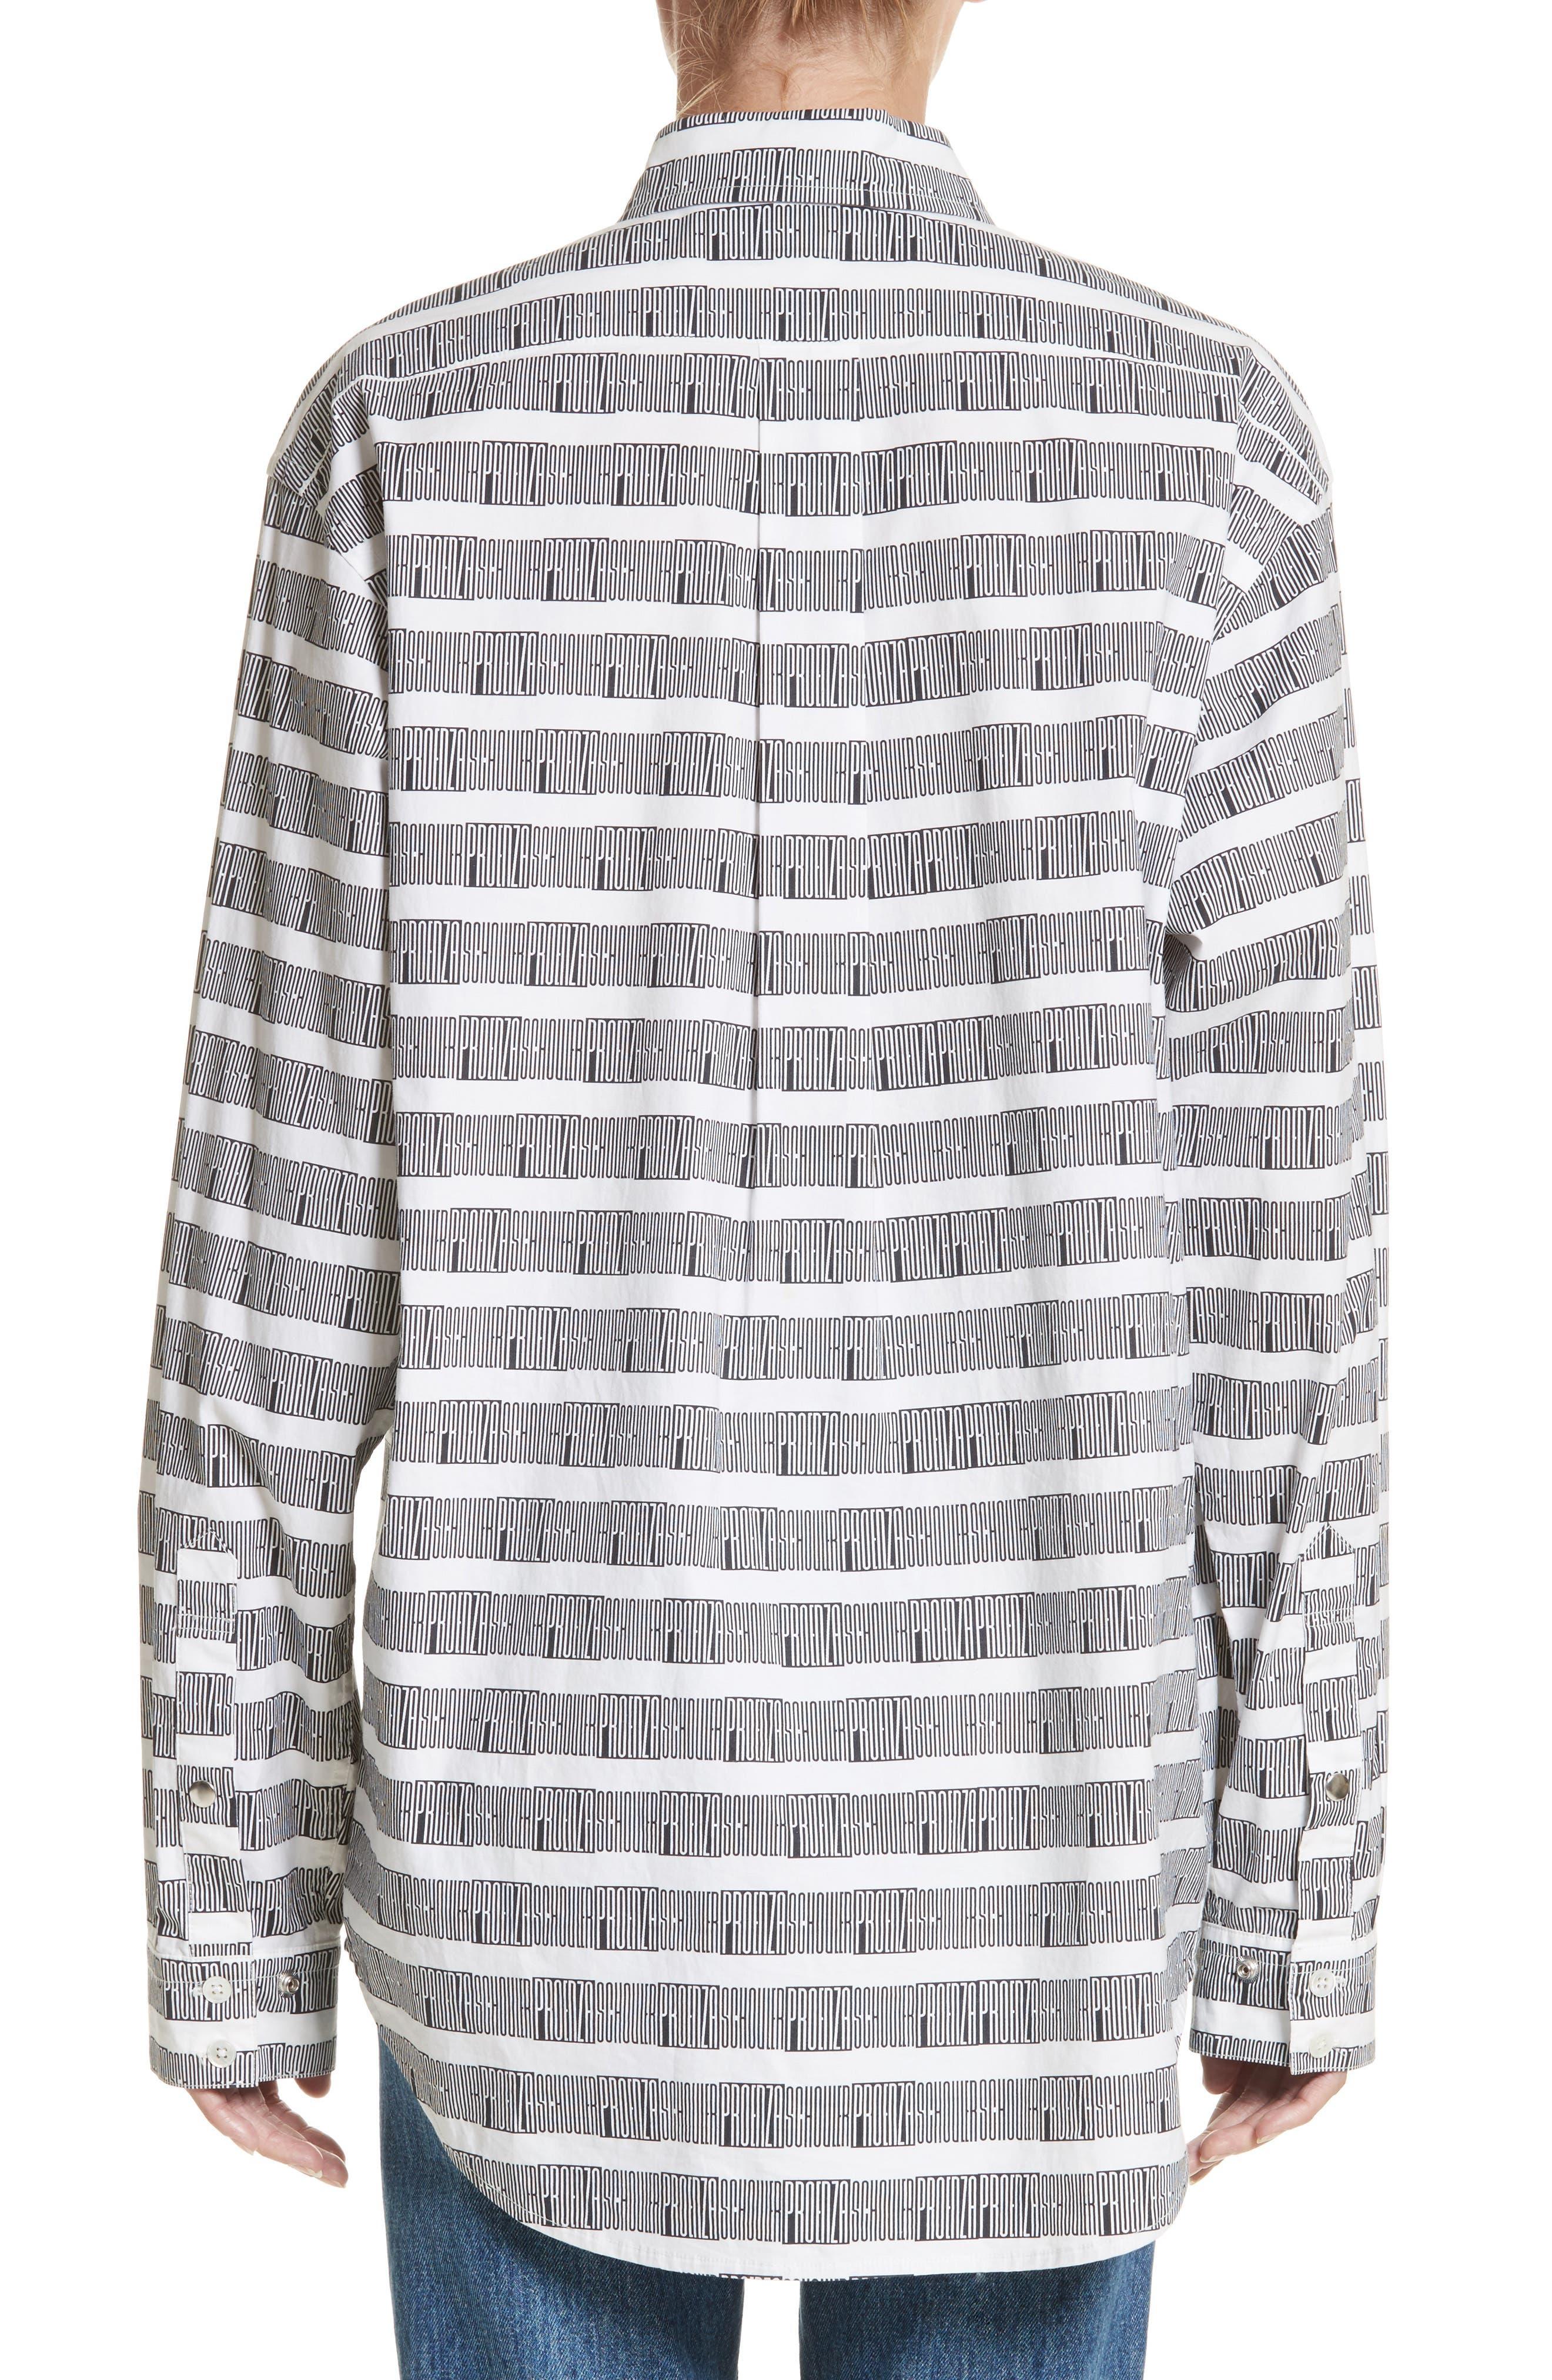 PSWL Graphic Stripe Cotton Top,                             Alternate thumbnail 2, color,                             001